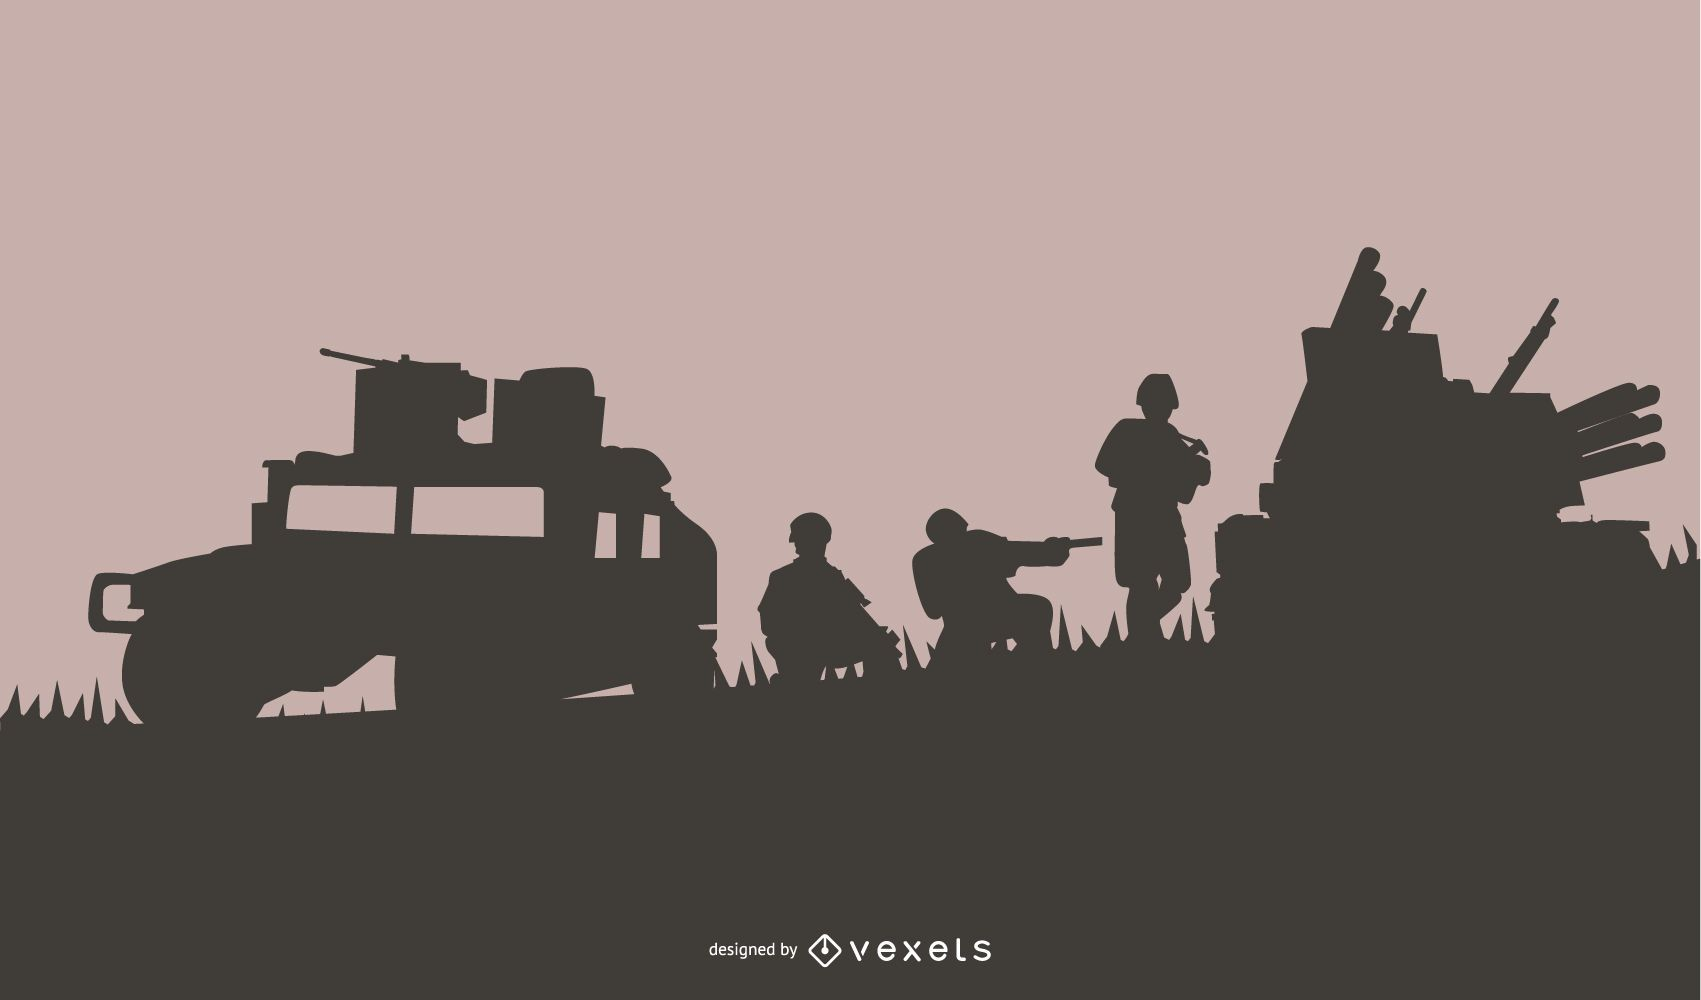 Fondo de silueta de escena militar